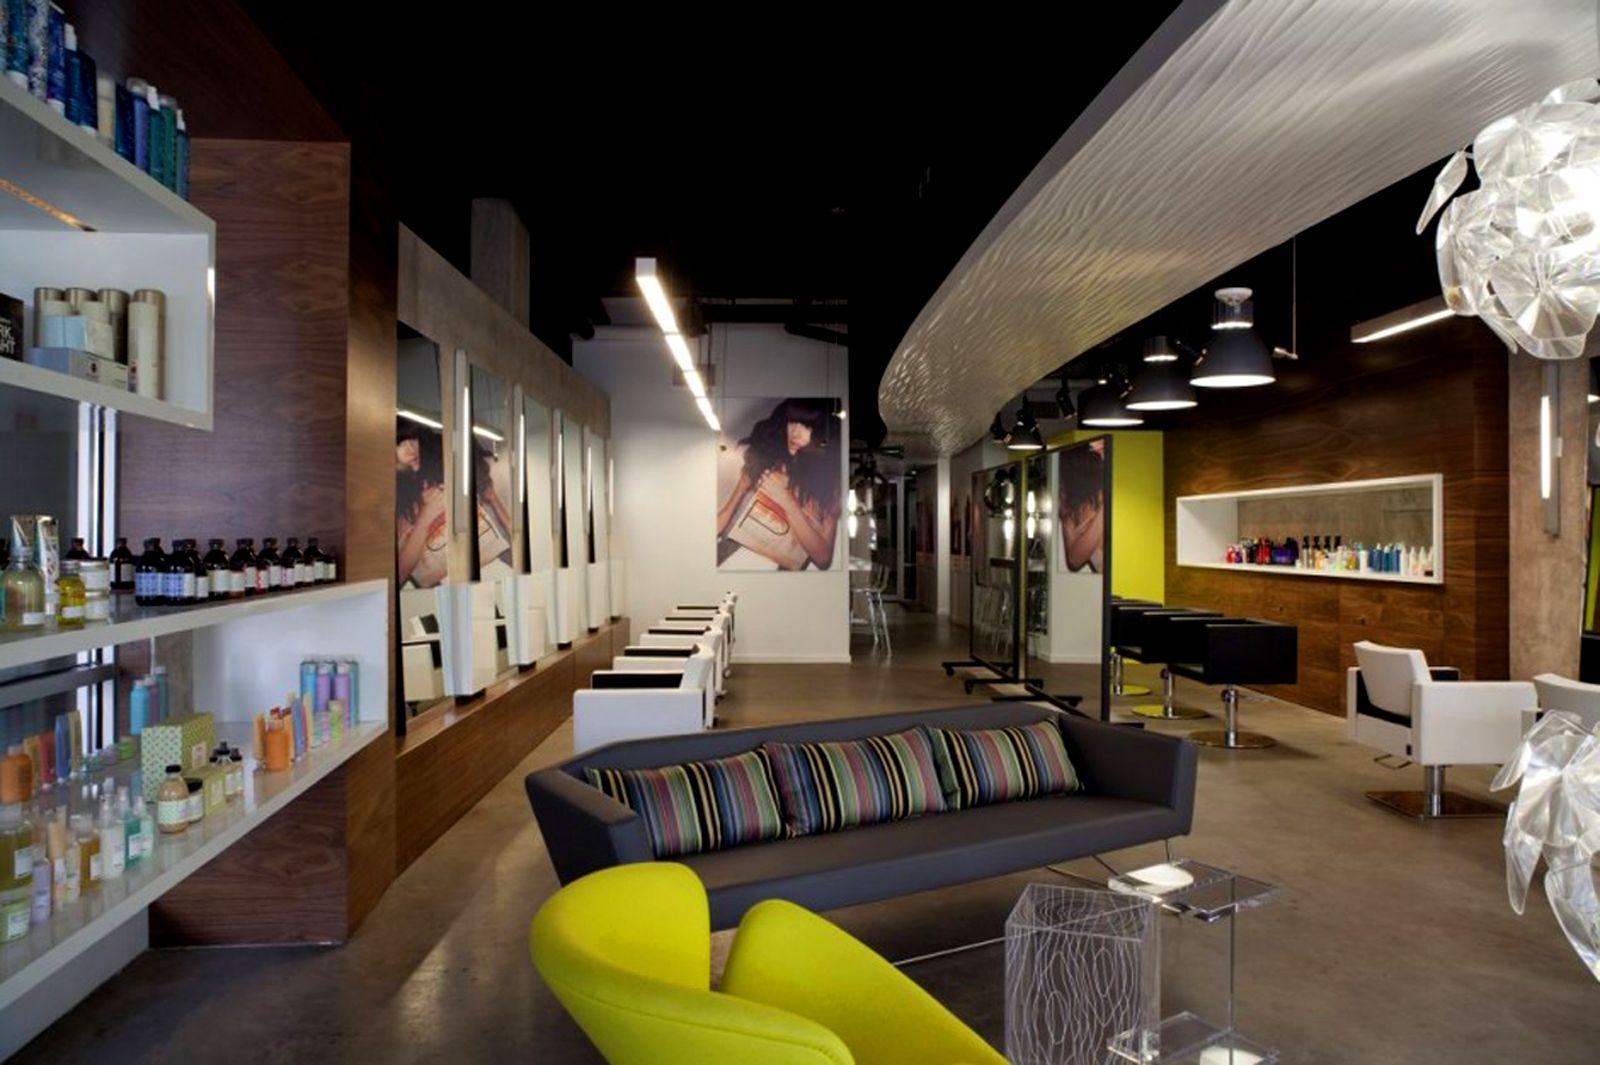 Salon Design Ideas Salon Spa Interior Design Ideas To Download Salon Spa Interior Design Salon Interior Design Spa Interior Design Hair Salon Interior